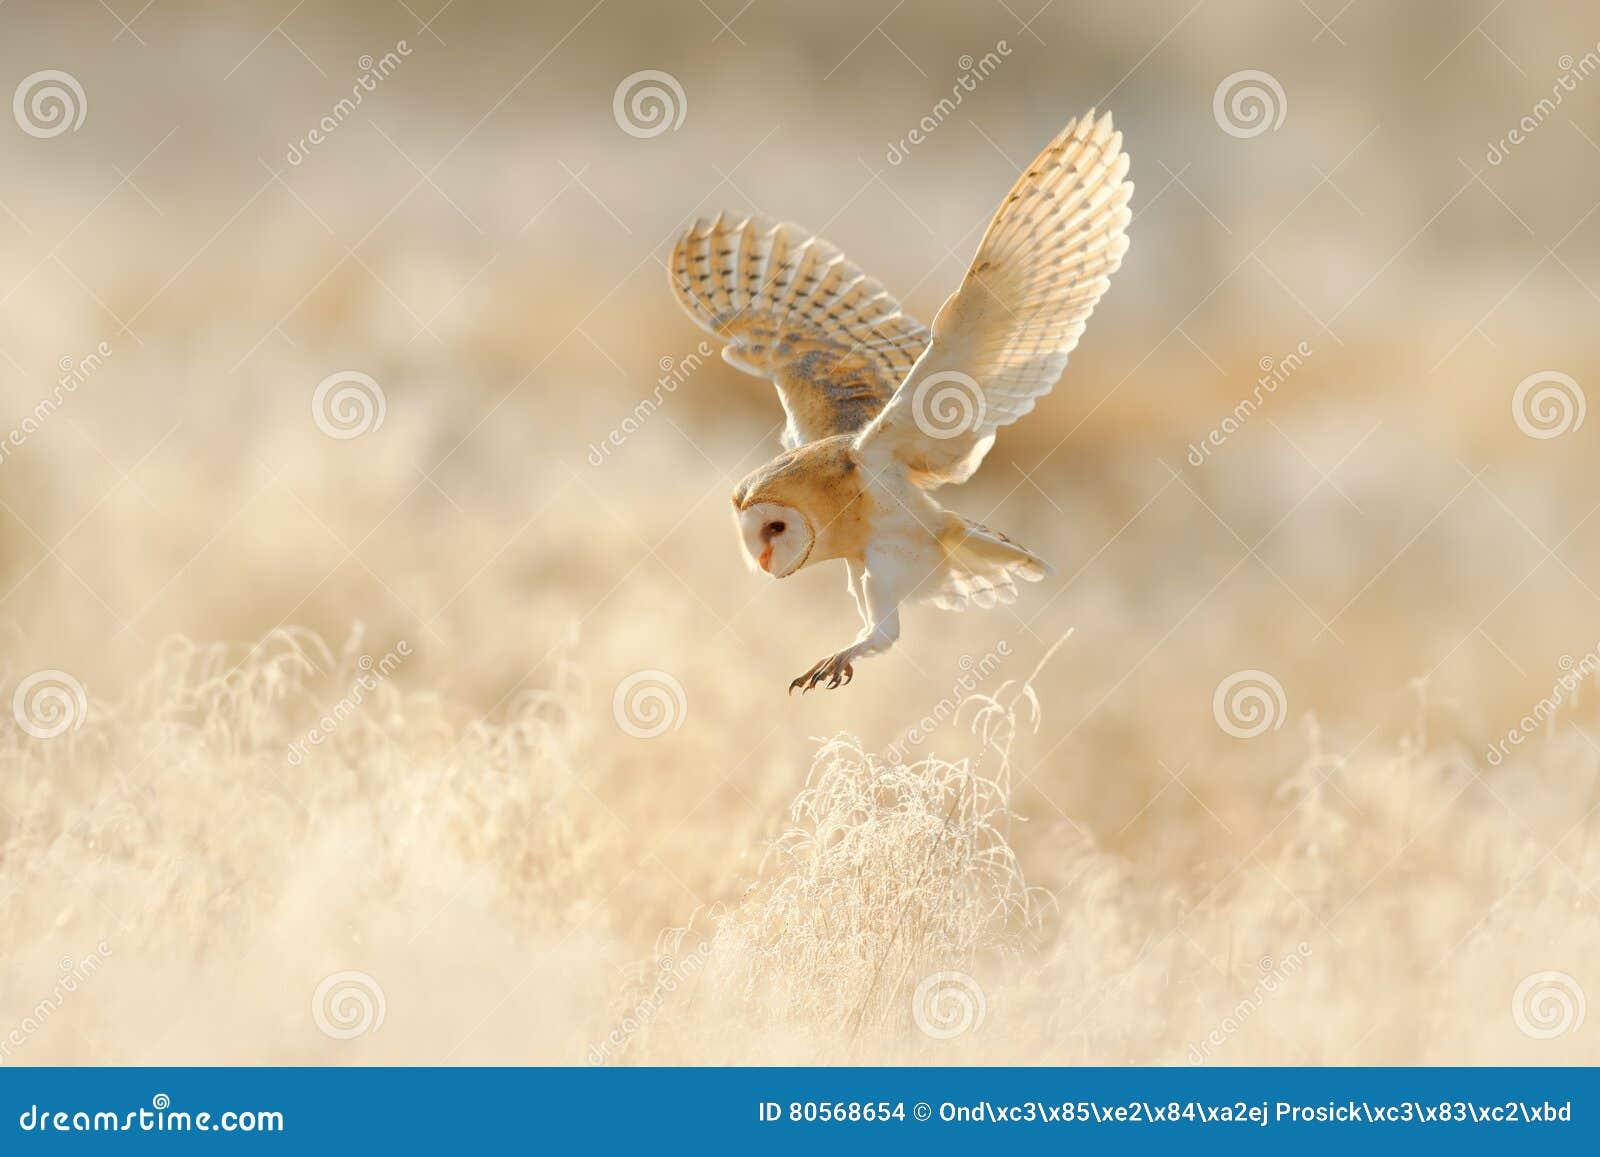 Owl flight. Hunting Barn Owl, wild bird in morning nice light. Beautiful animal in the nature habitat. Owl landing in the grass. A